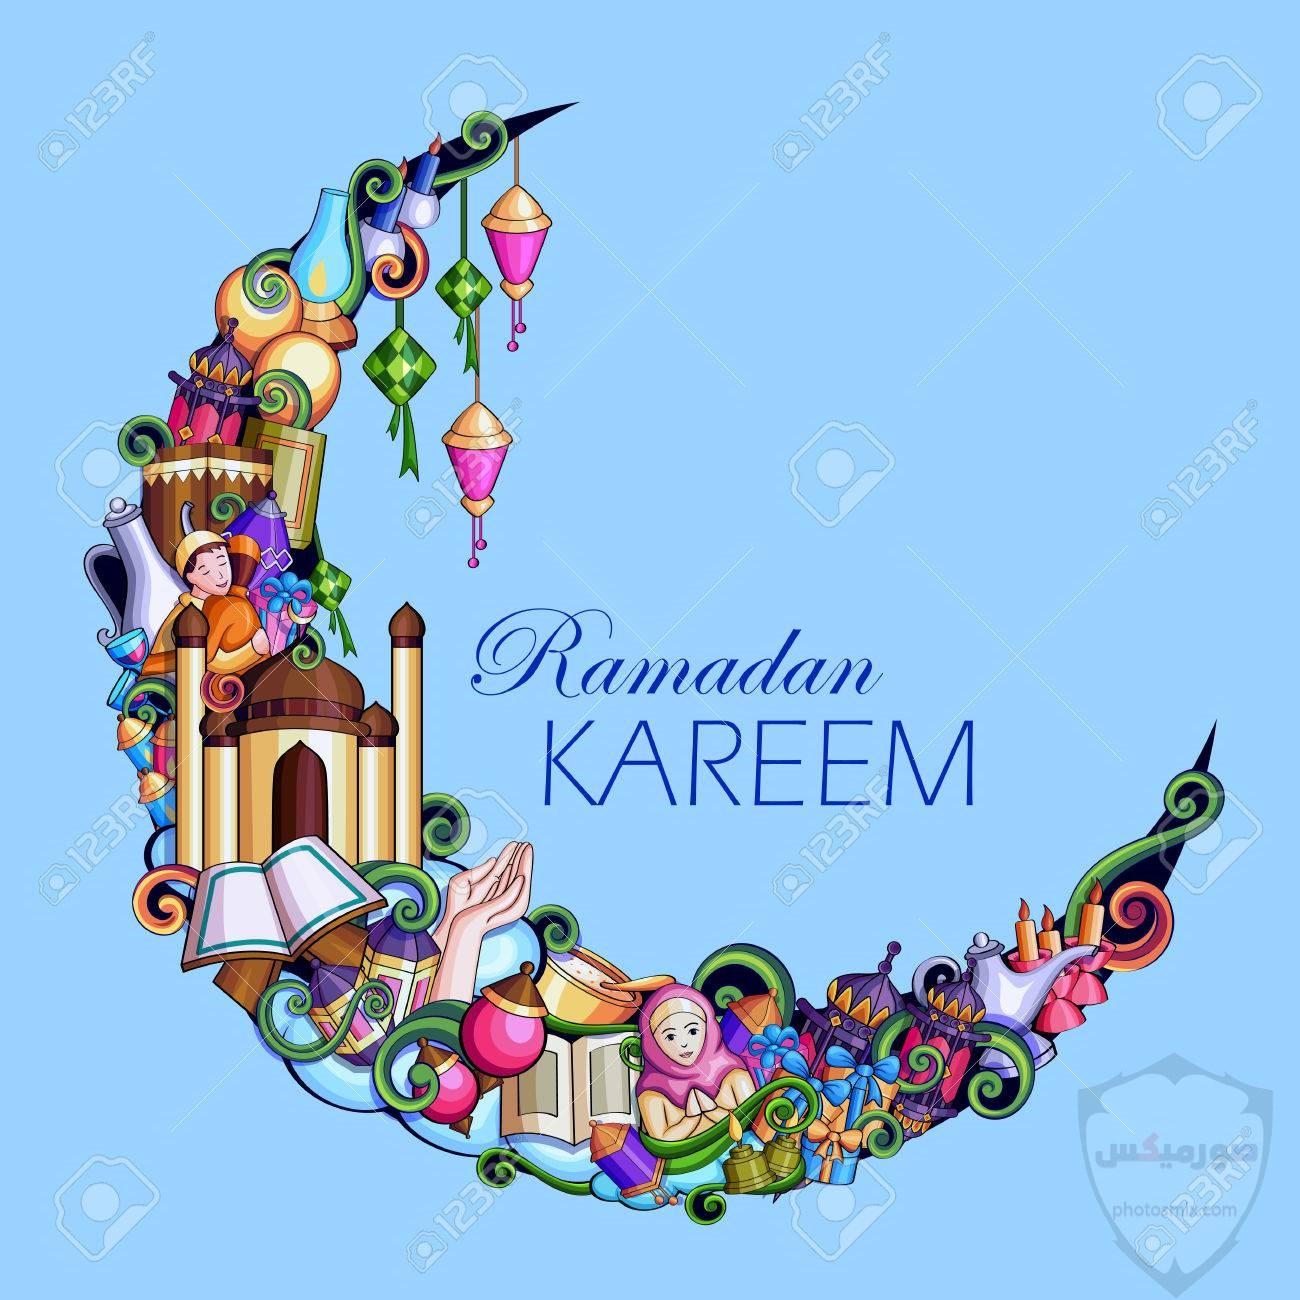 صور رمضان 2020 أجمل صور فوانيس رمضان 2021 بطاقات تهنئة لرمضان تهنئة رمضان بالأسماء 17